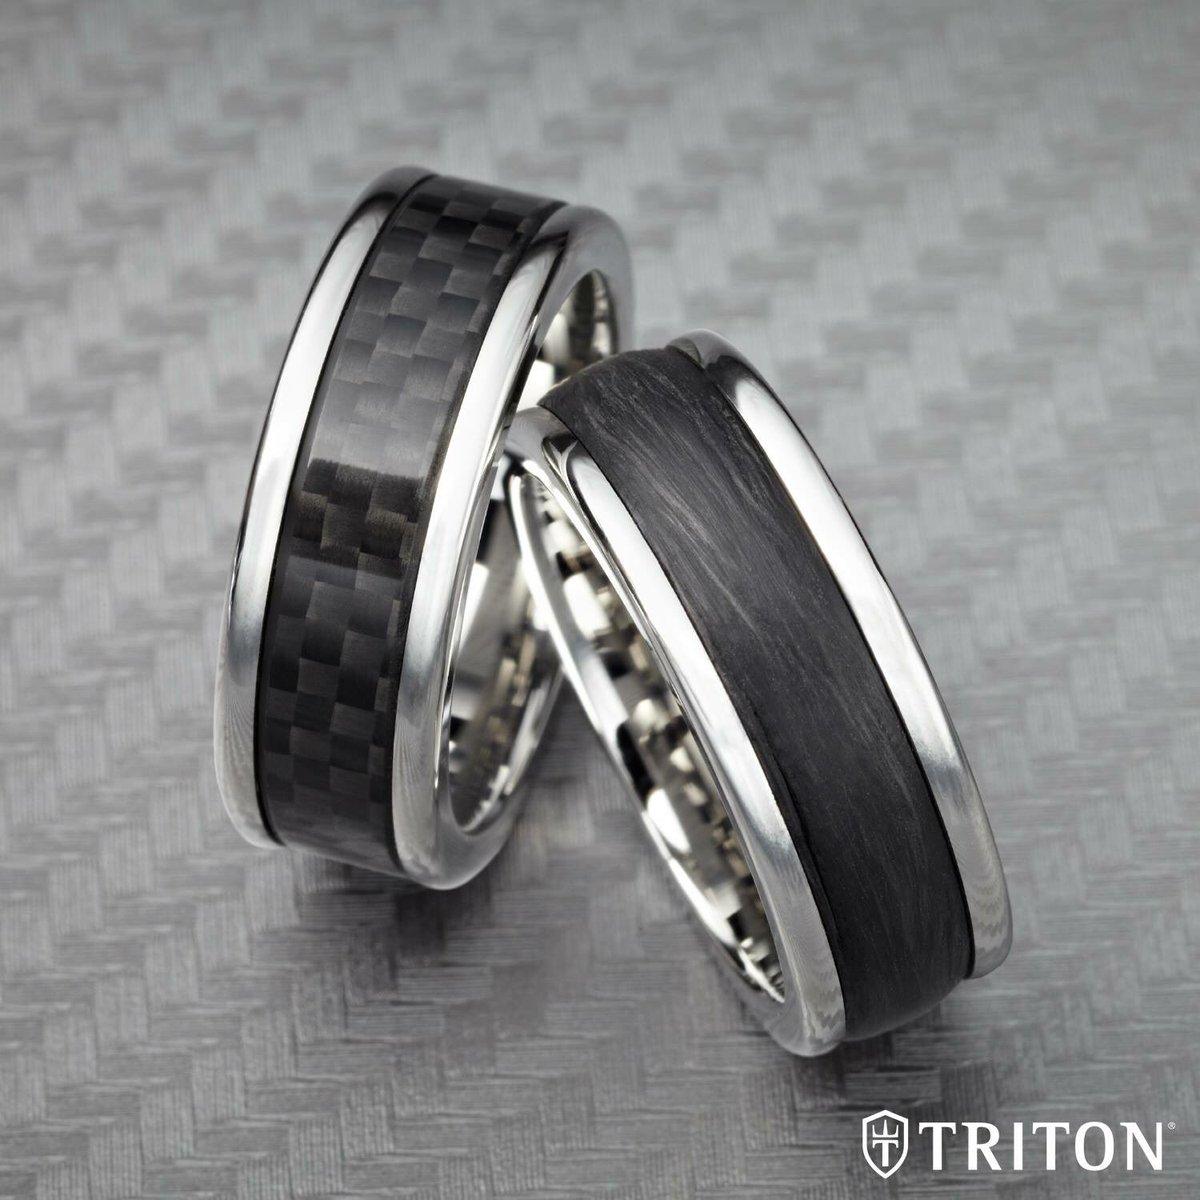 tritoncustom hashtag on Twitter